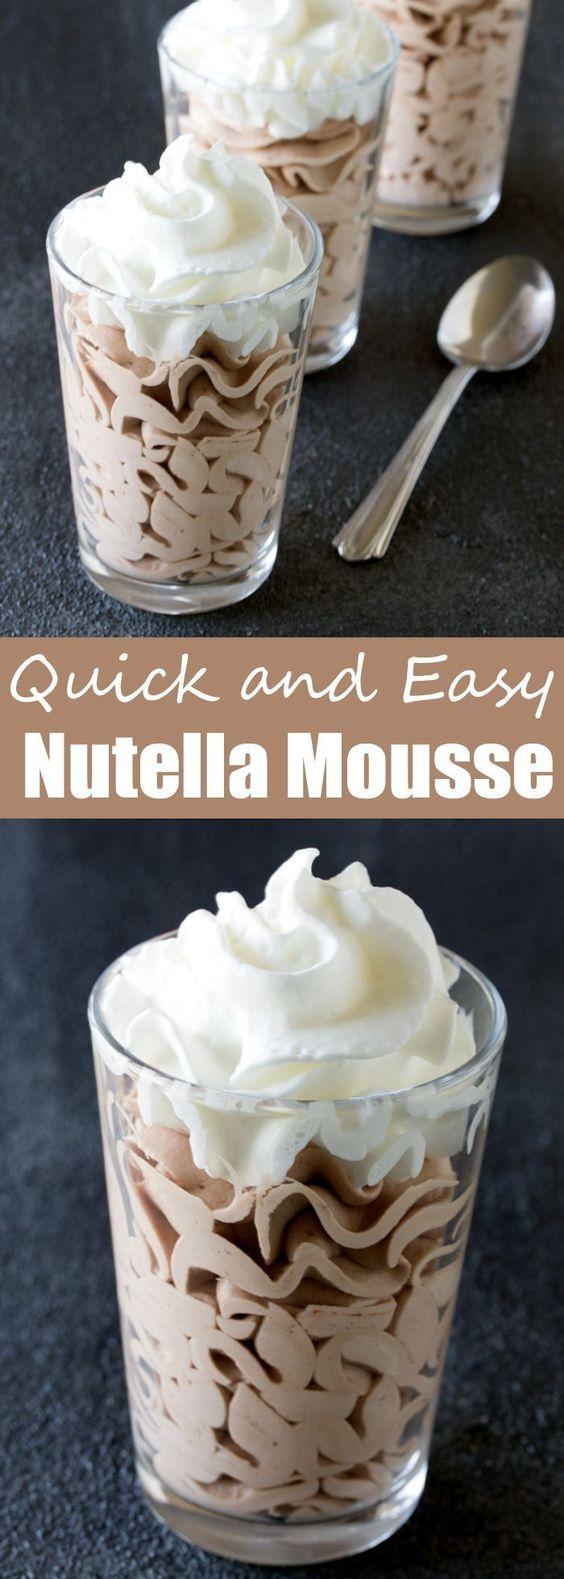 Quick and Easy Nutella Mousse #easyrecipe #dessert